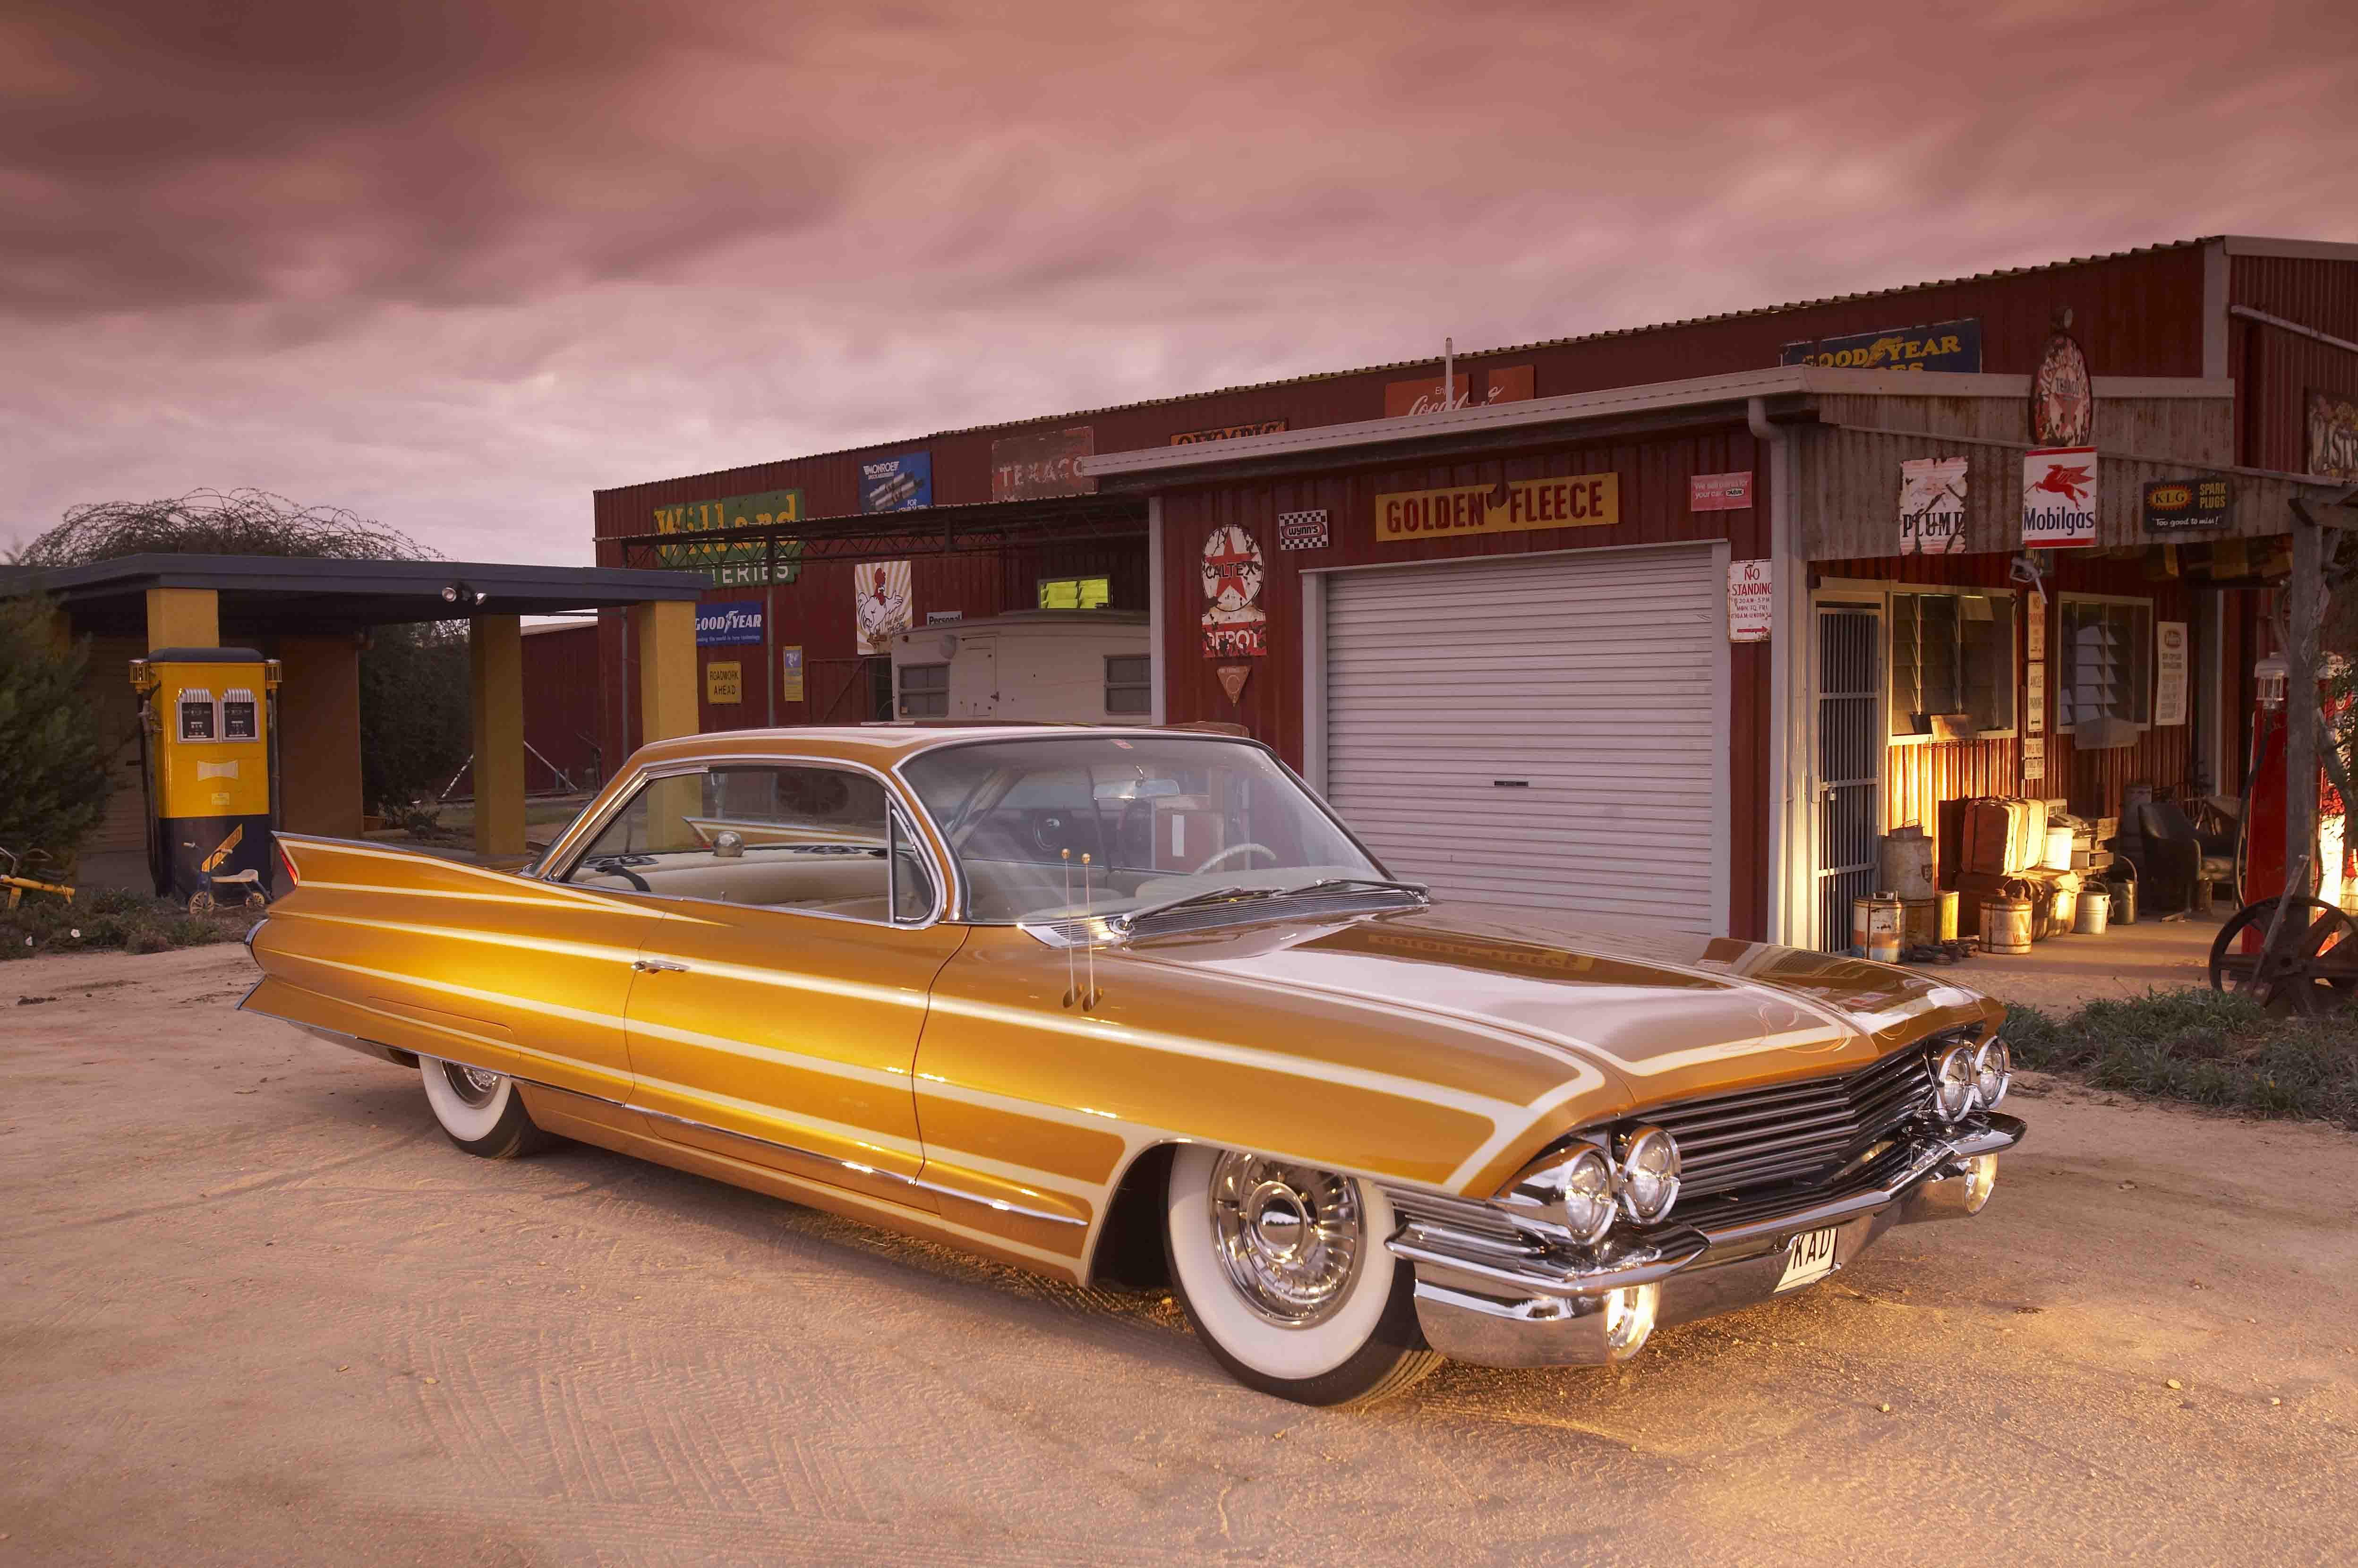 Lowrider Custpm Cadillac G Wallpaper